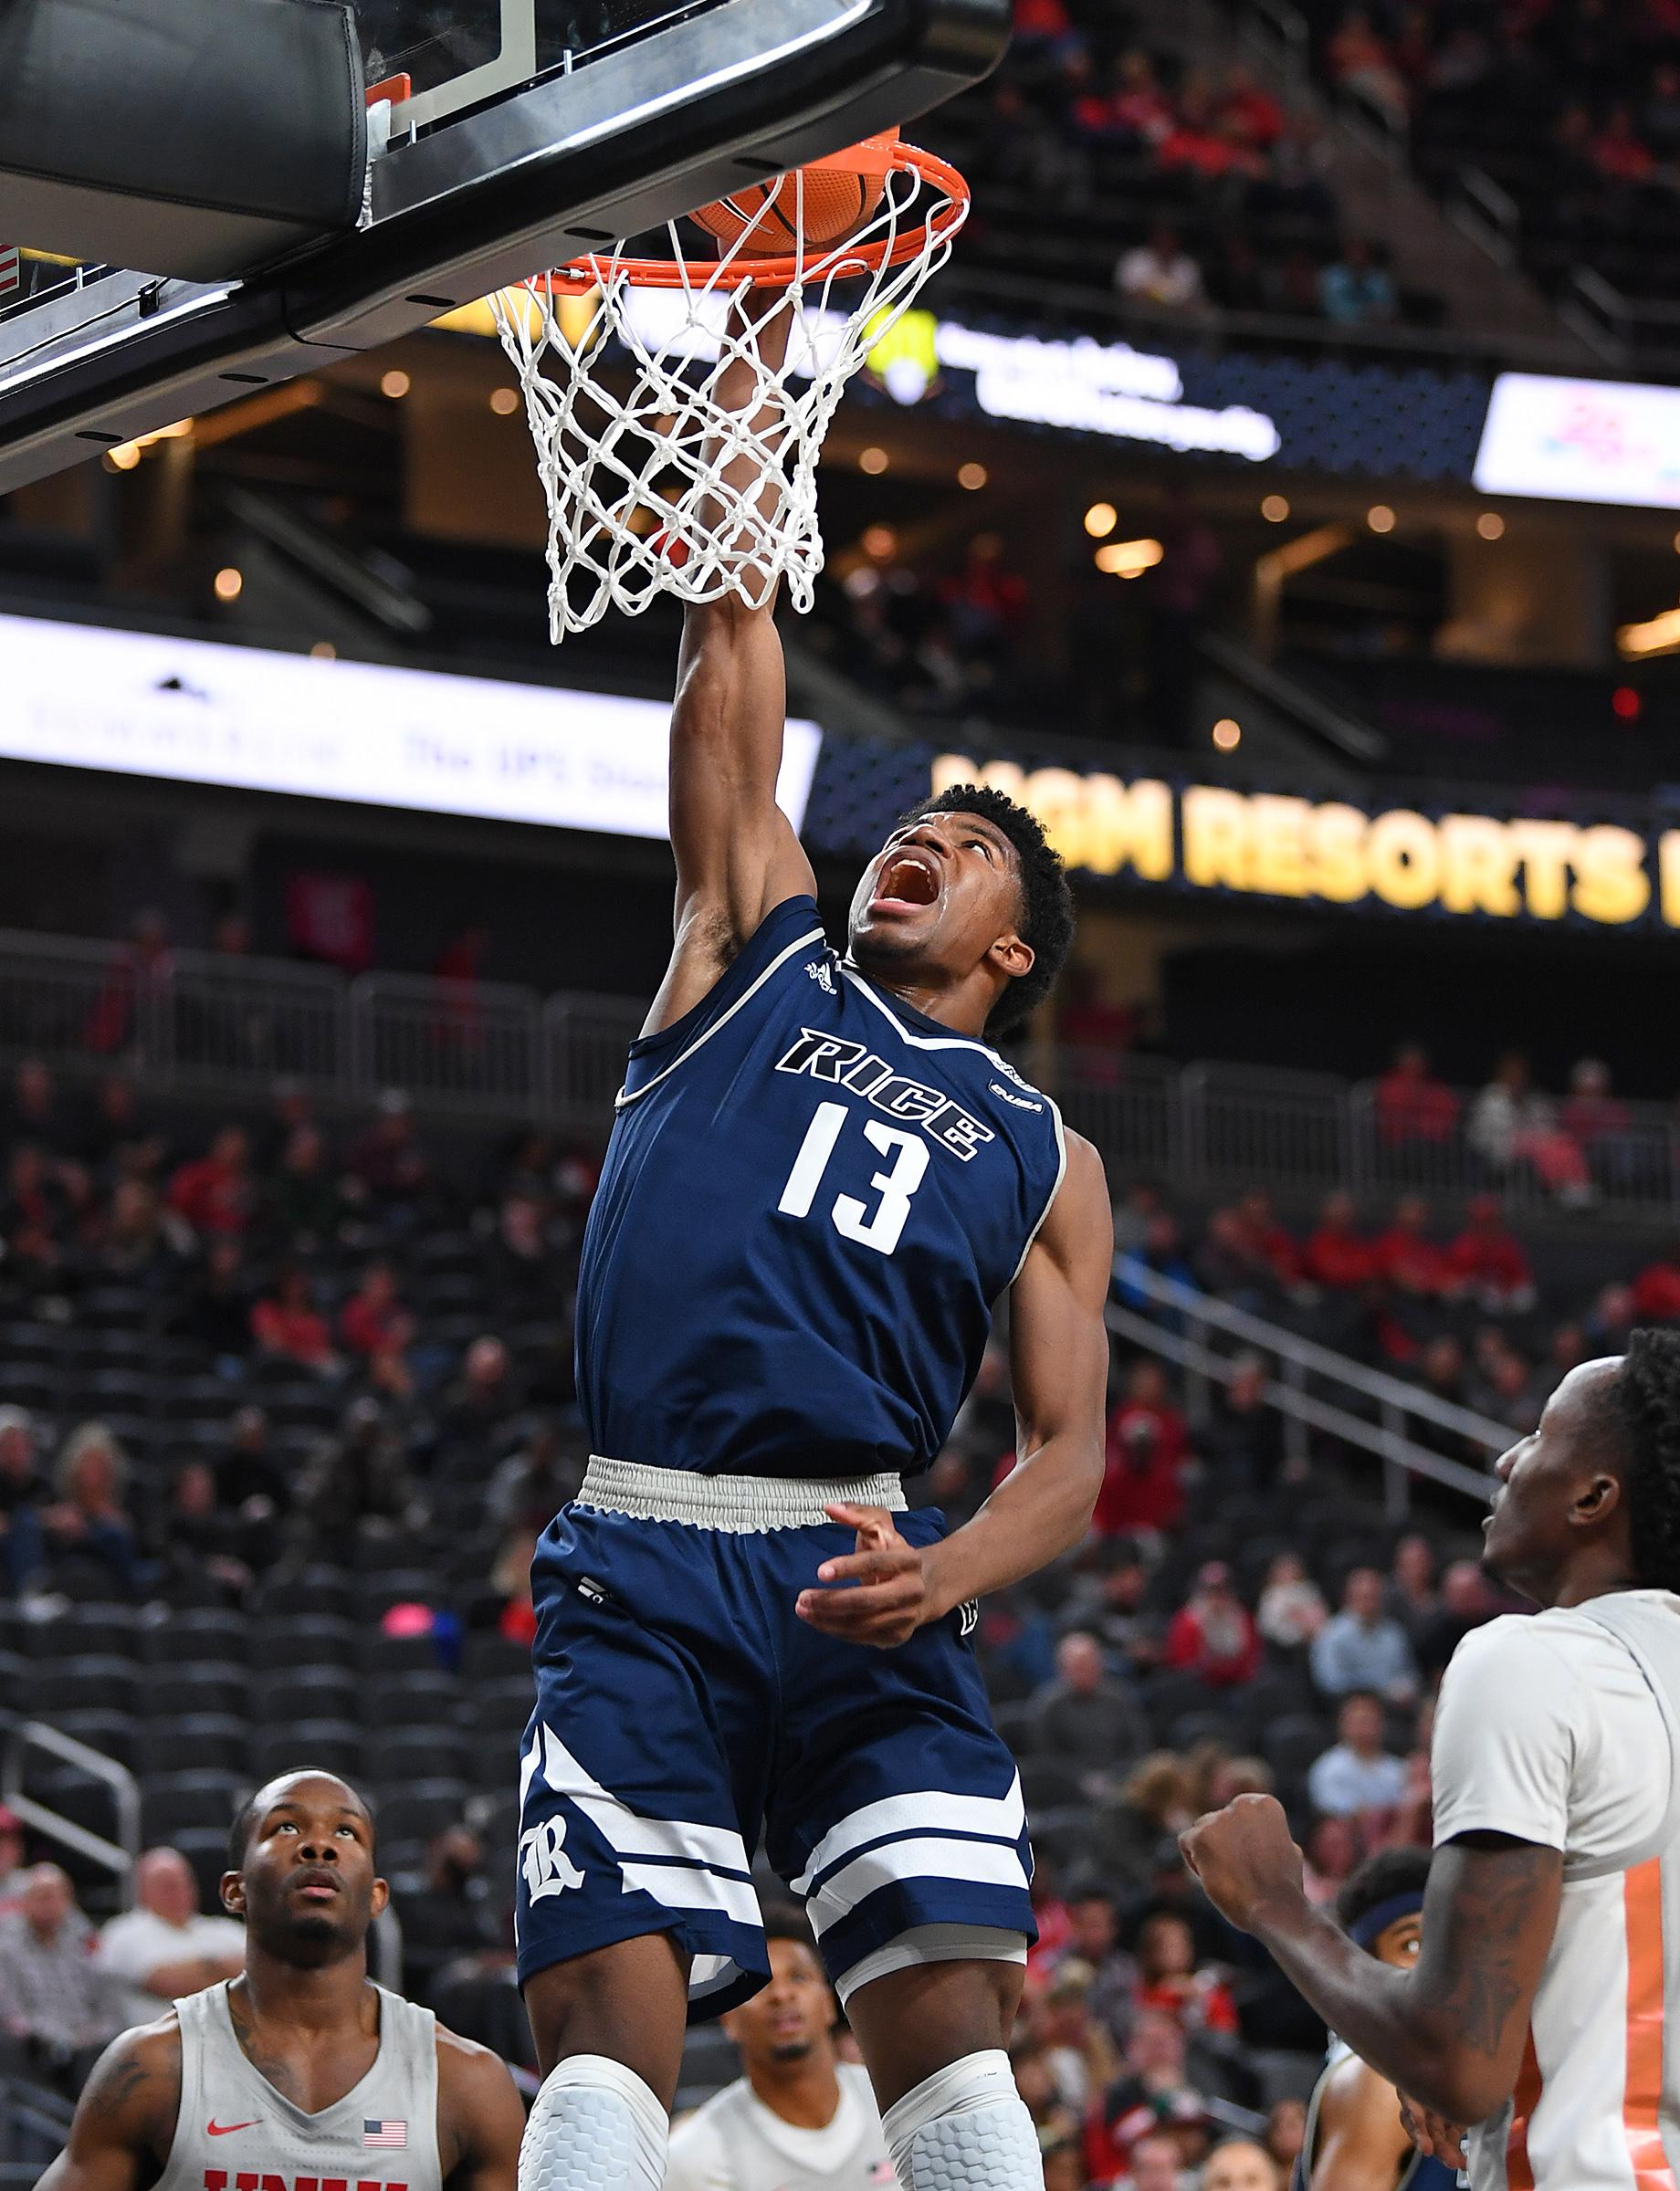 NCAA Basketball: Rice at UNLV